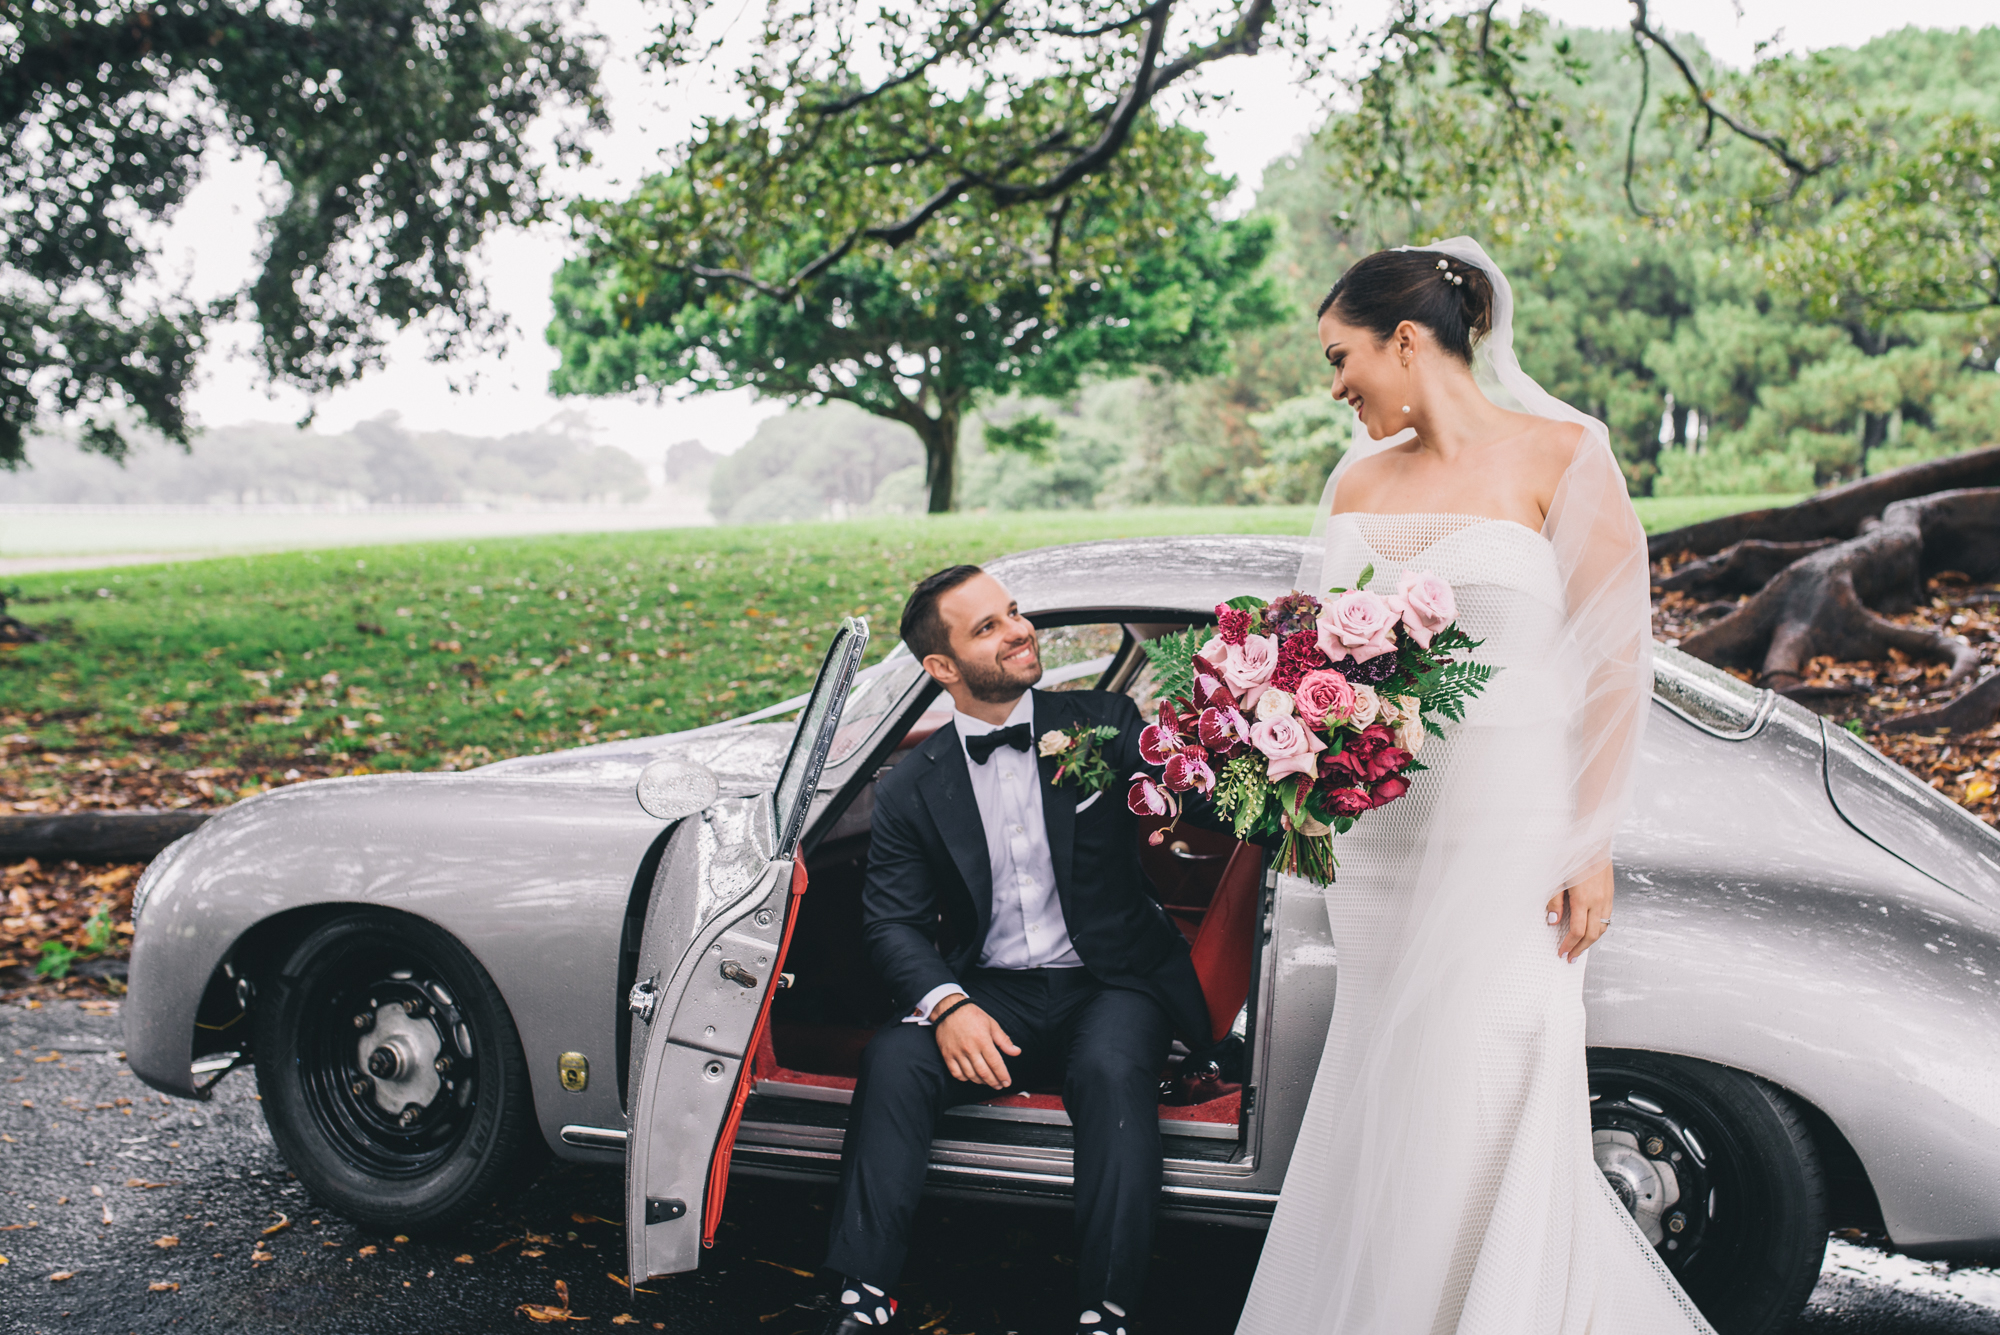 tropica-weddings-dianna-daniel-67.jpg